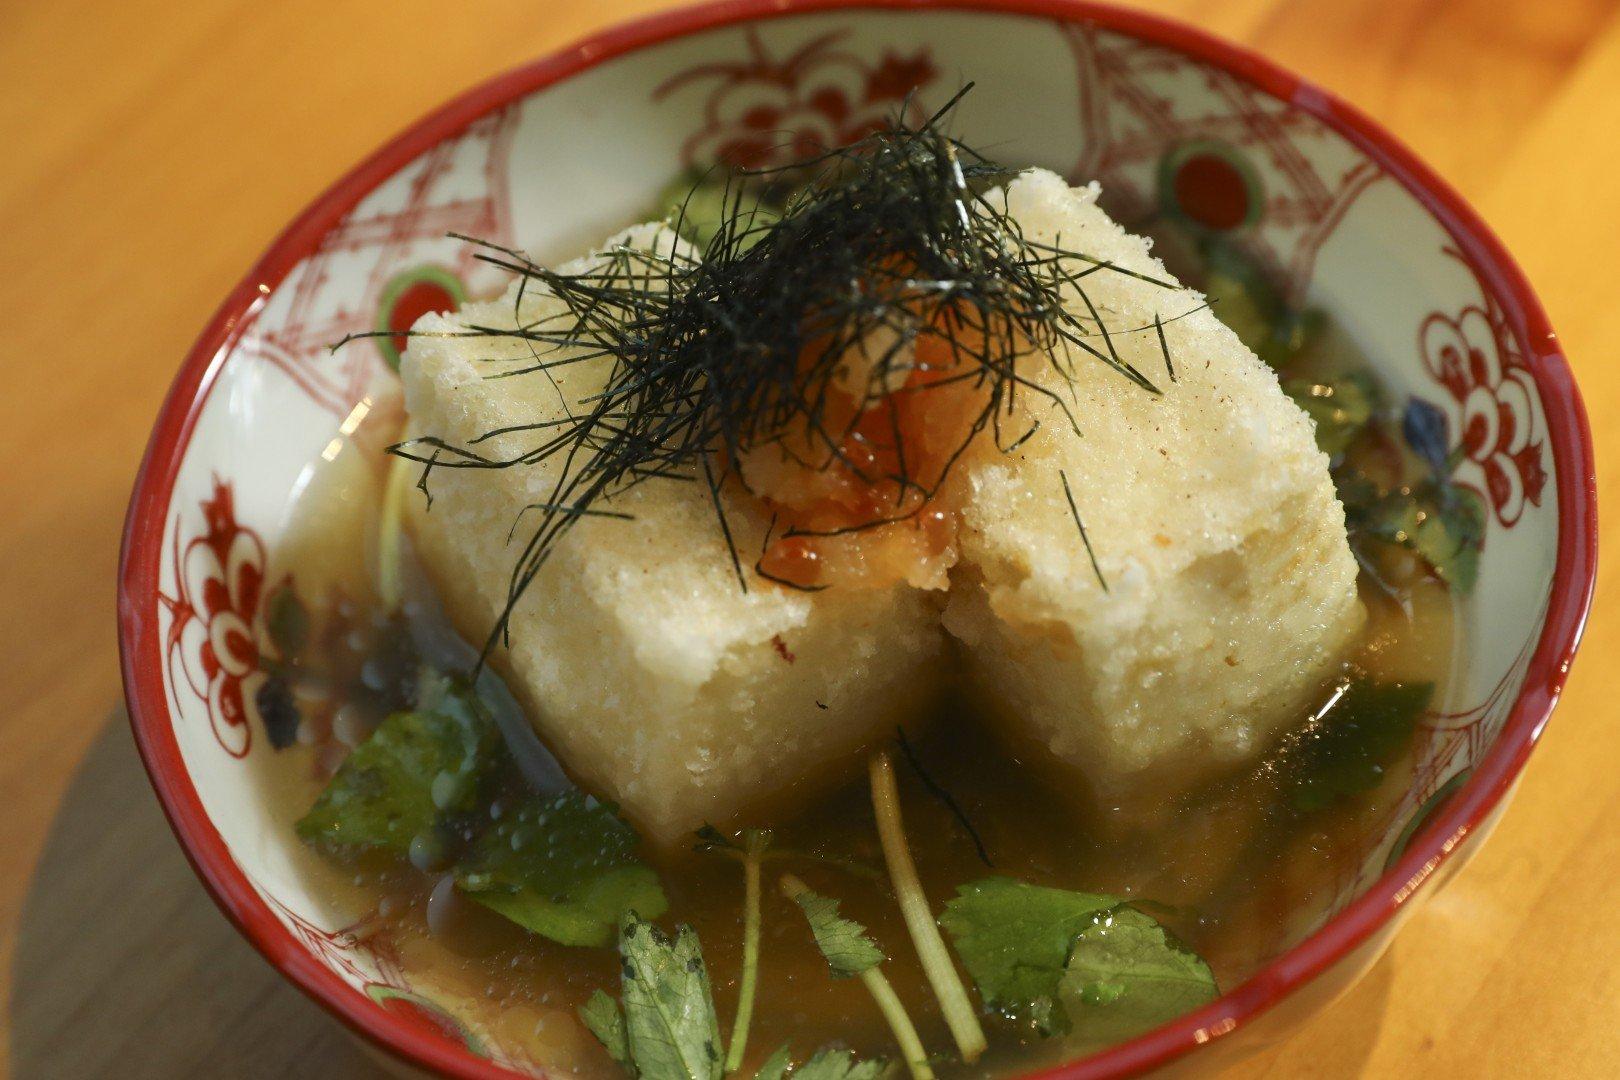 Awe Inspiring Hong Kong Izakaya Rerere 1001 Kushiyaki Friendly Relaxed Home Interior And Landscaping Pimpapssignezvosmurscom